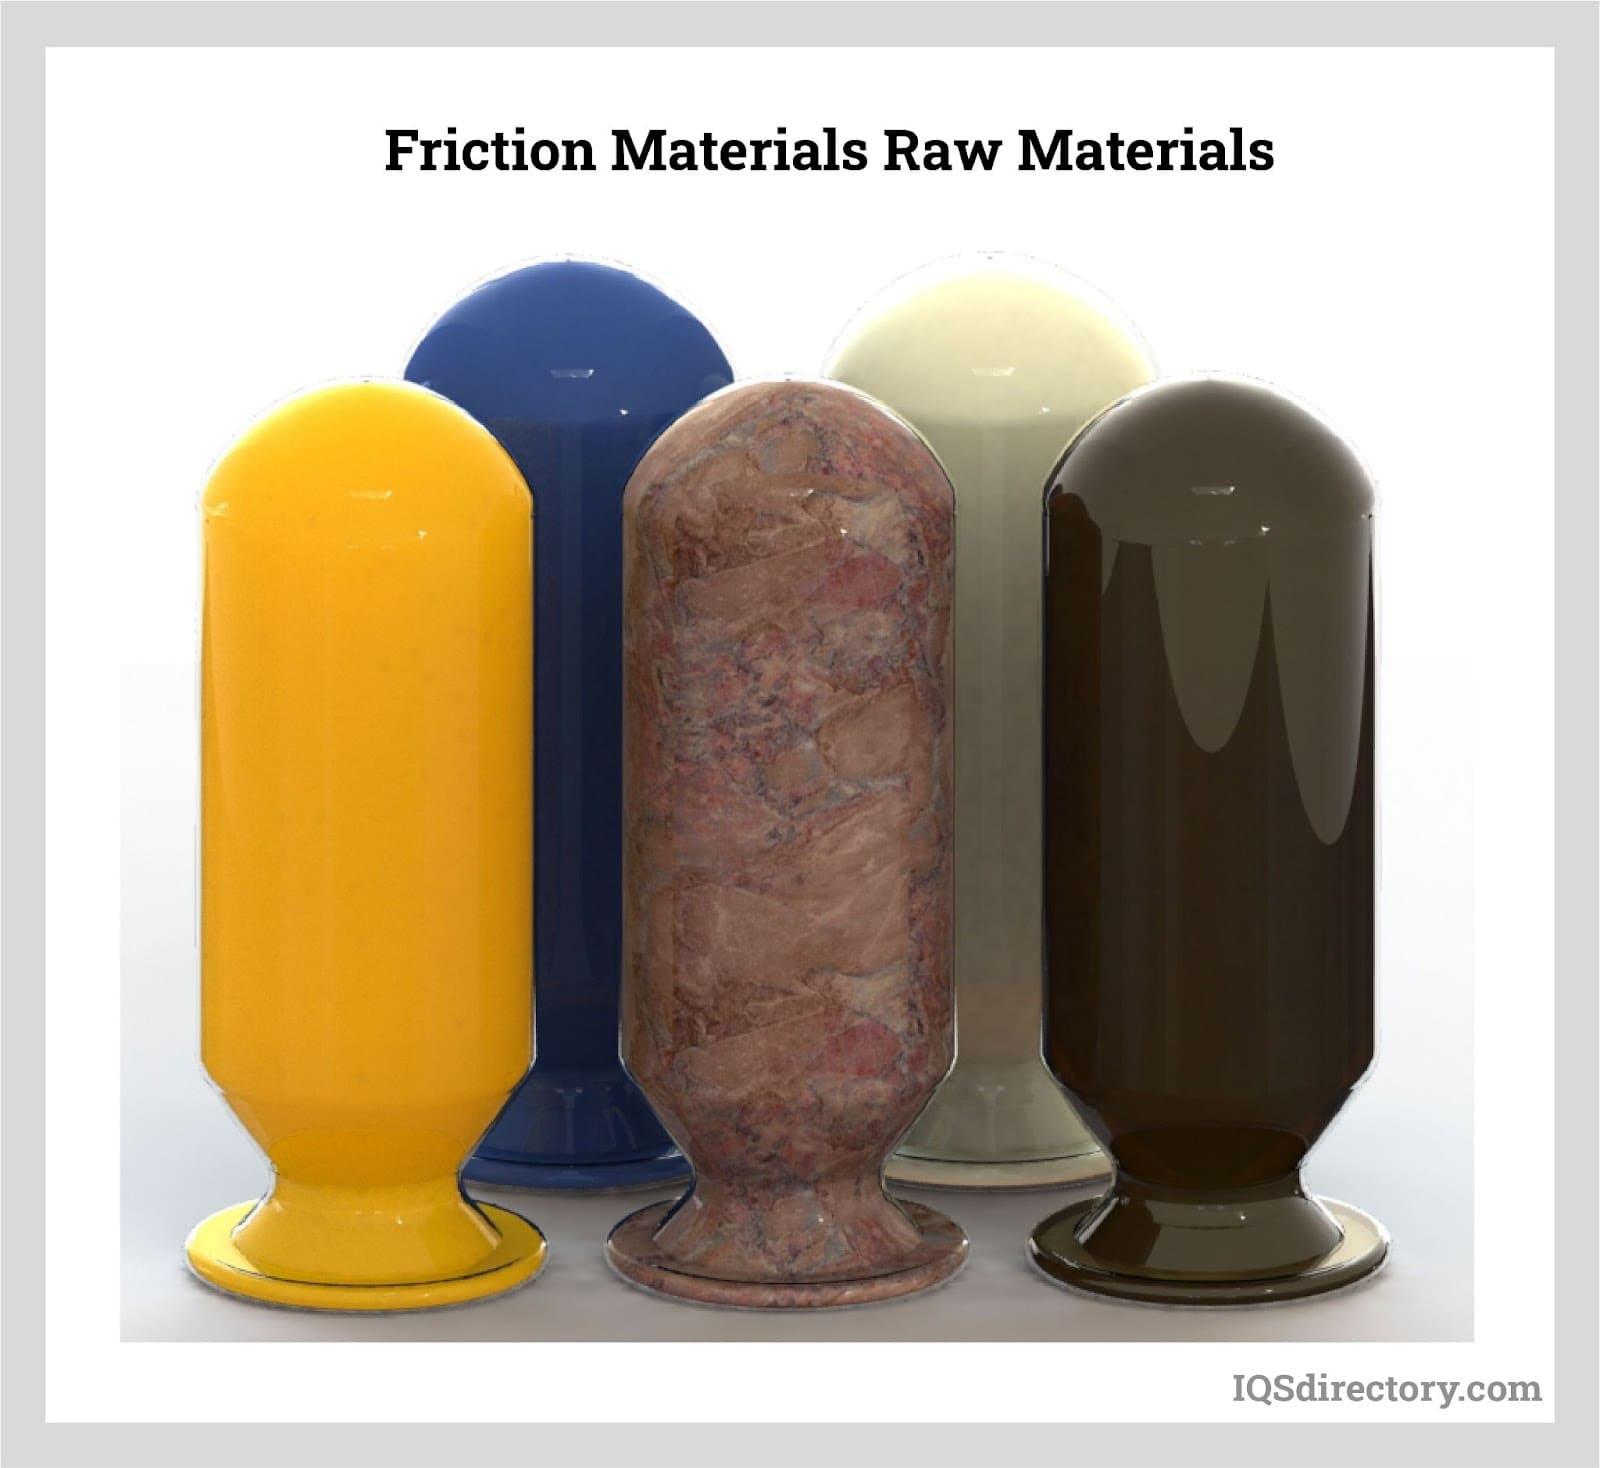 Friction Materials Raw Materials Phenolic Resin